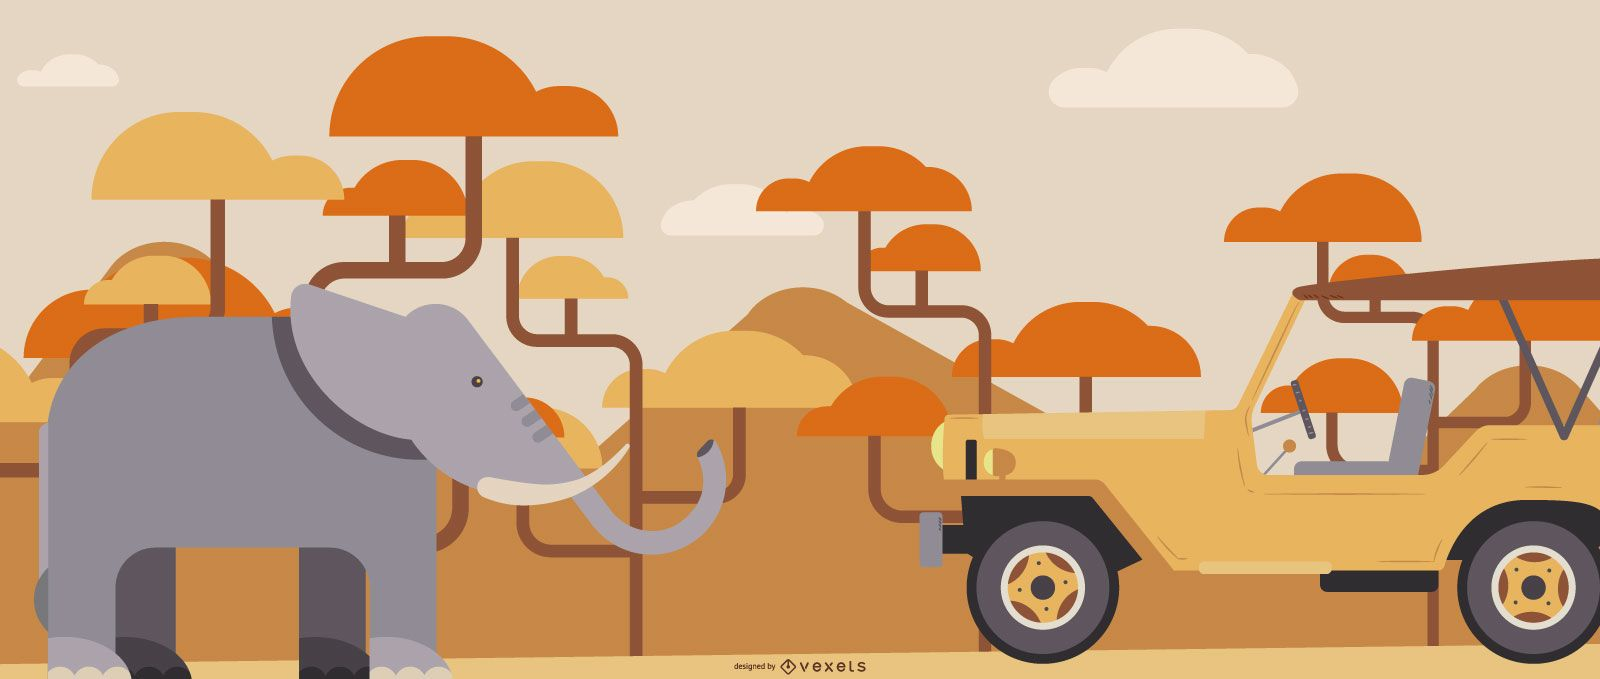 Ilustração plana do Safari